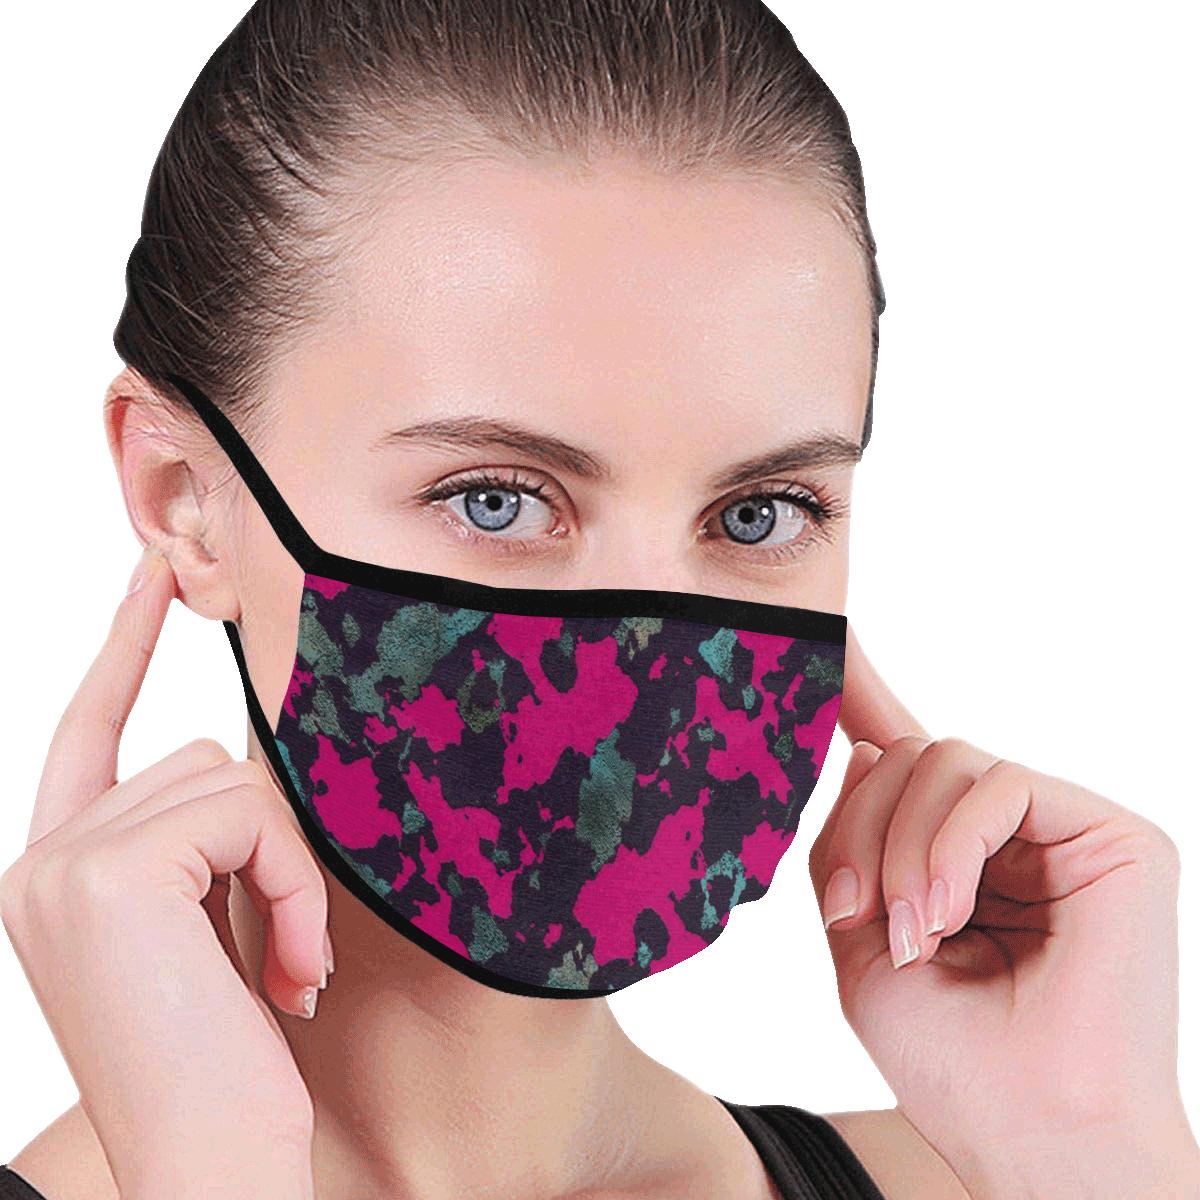 CAMOUFLAGE BLACKBERRY MASK Mouth Mask